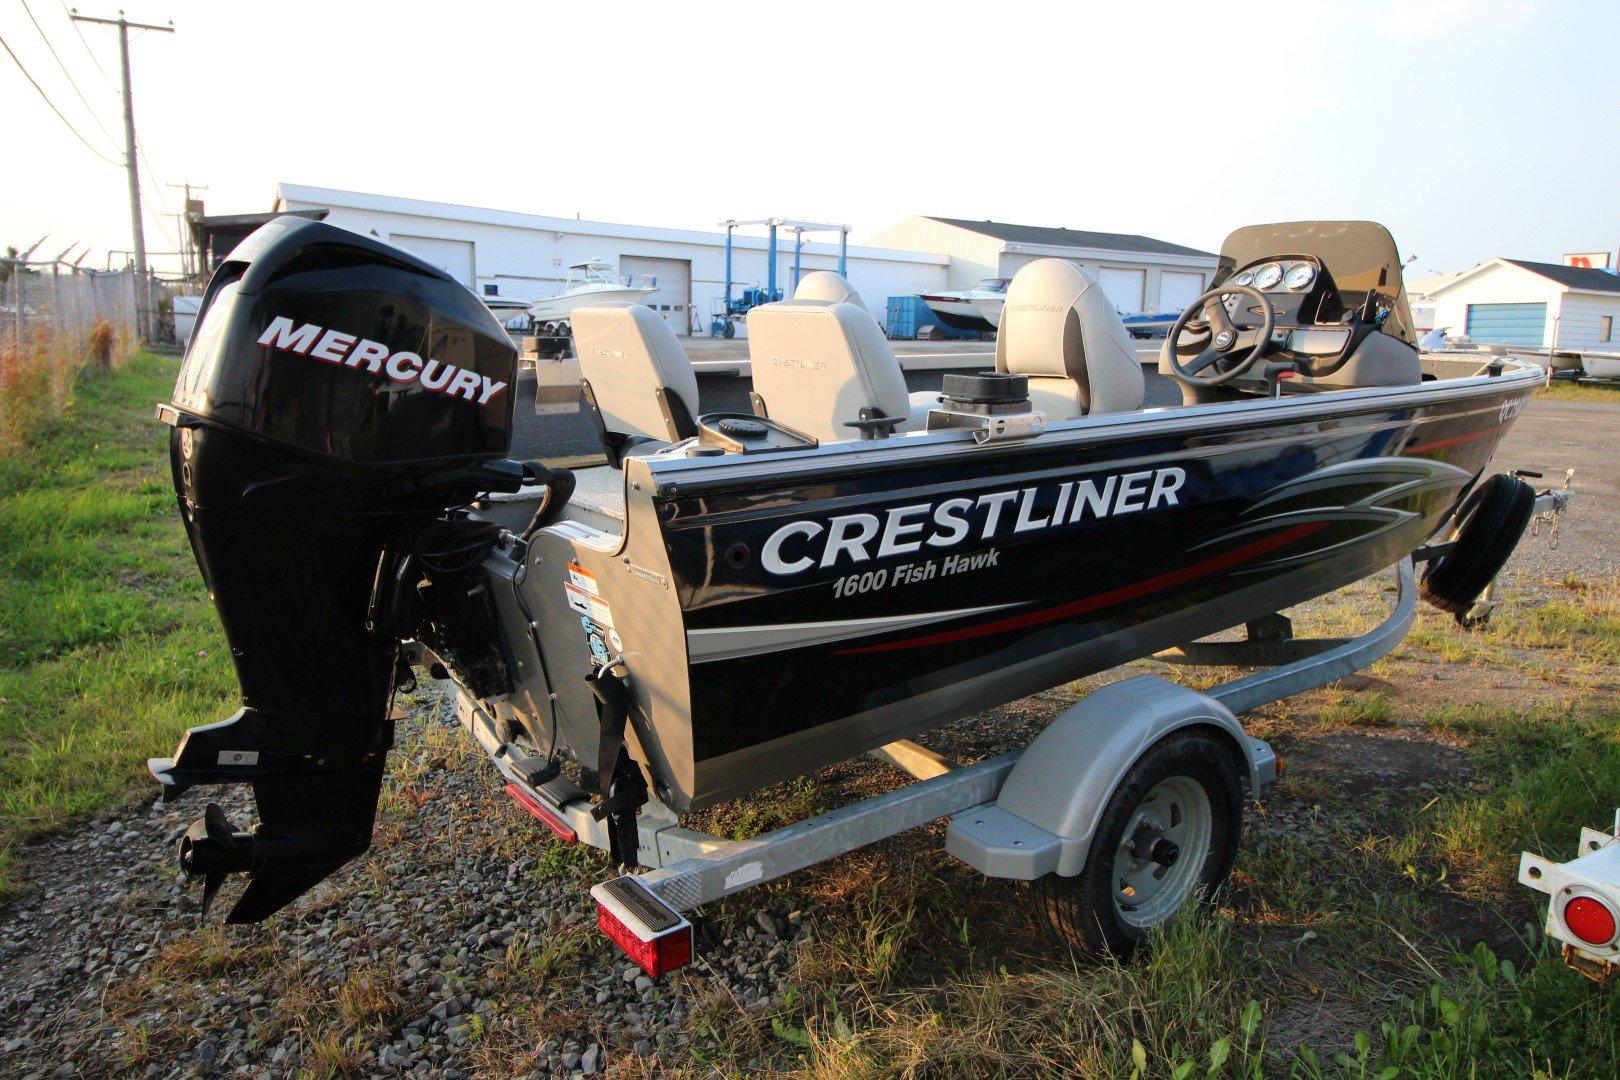 Crestliner FishHawk 1600 - IMG_1596